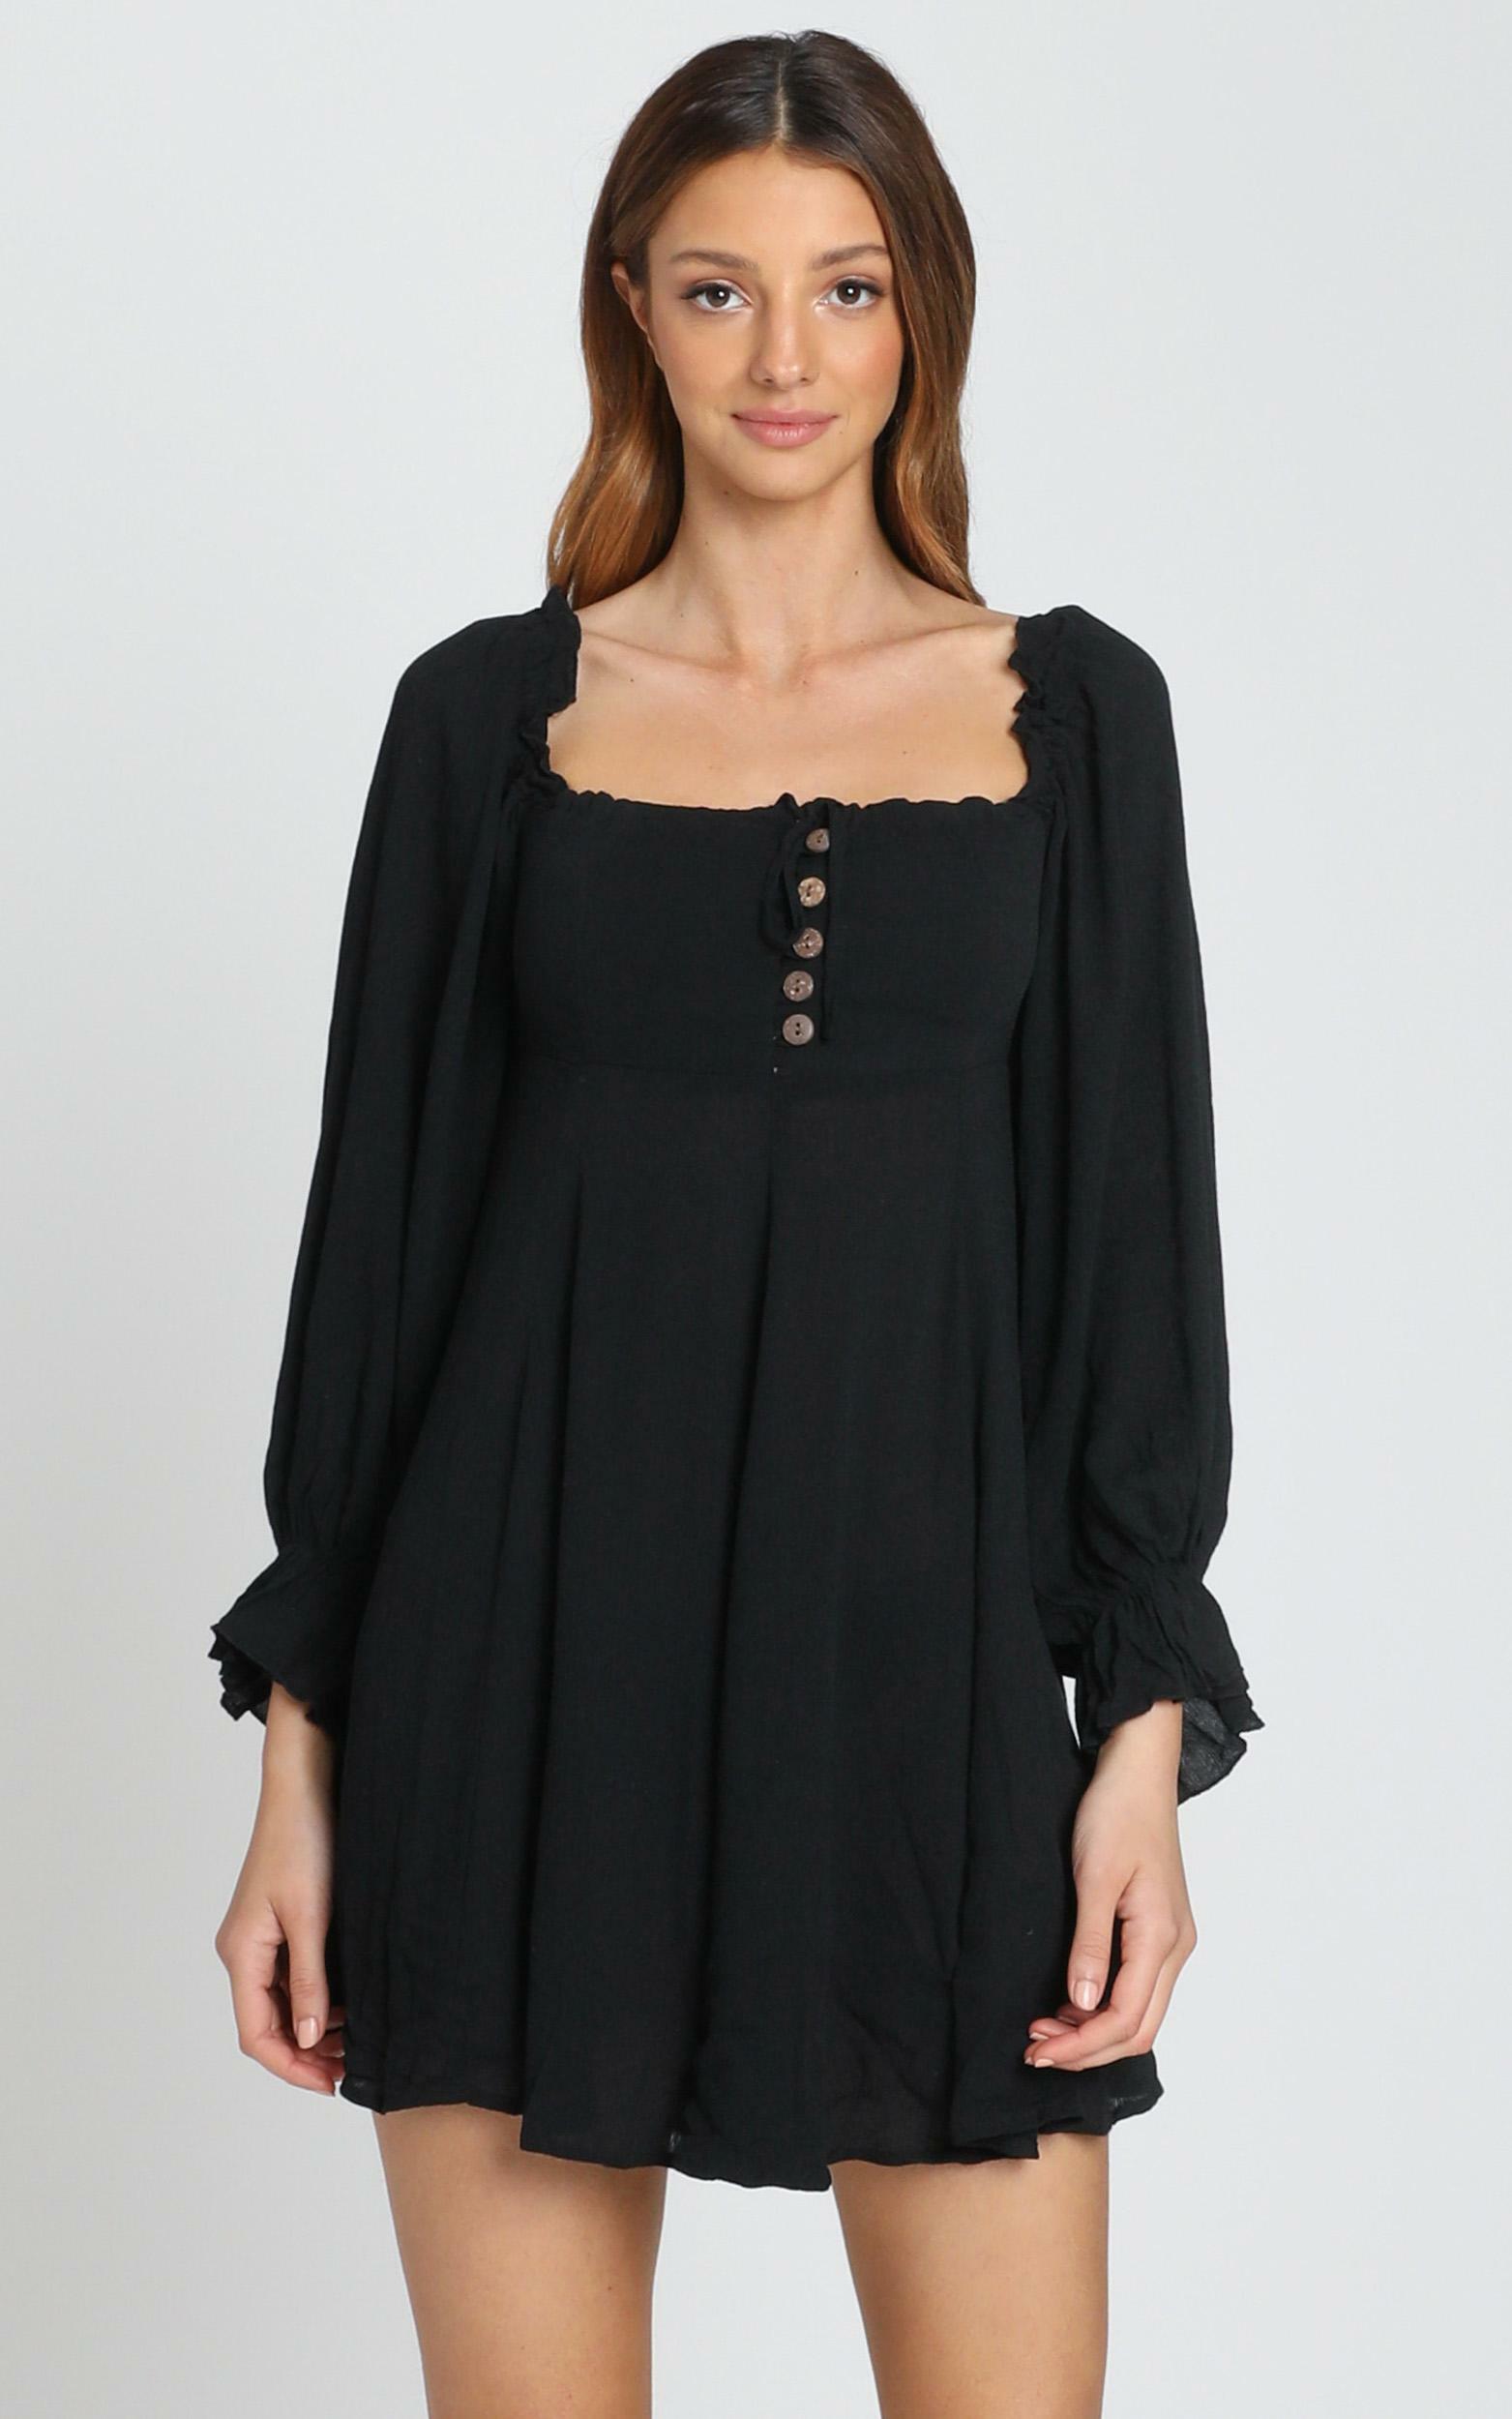 Gypsy Soul Dress in black - 6 (XS), Black, hi-res image number null